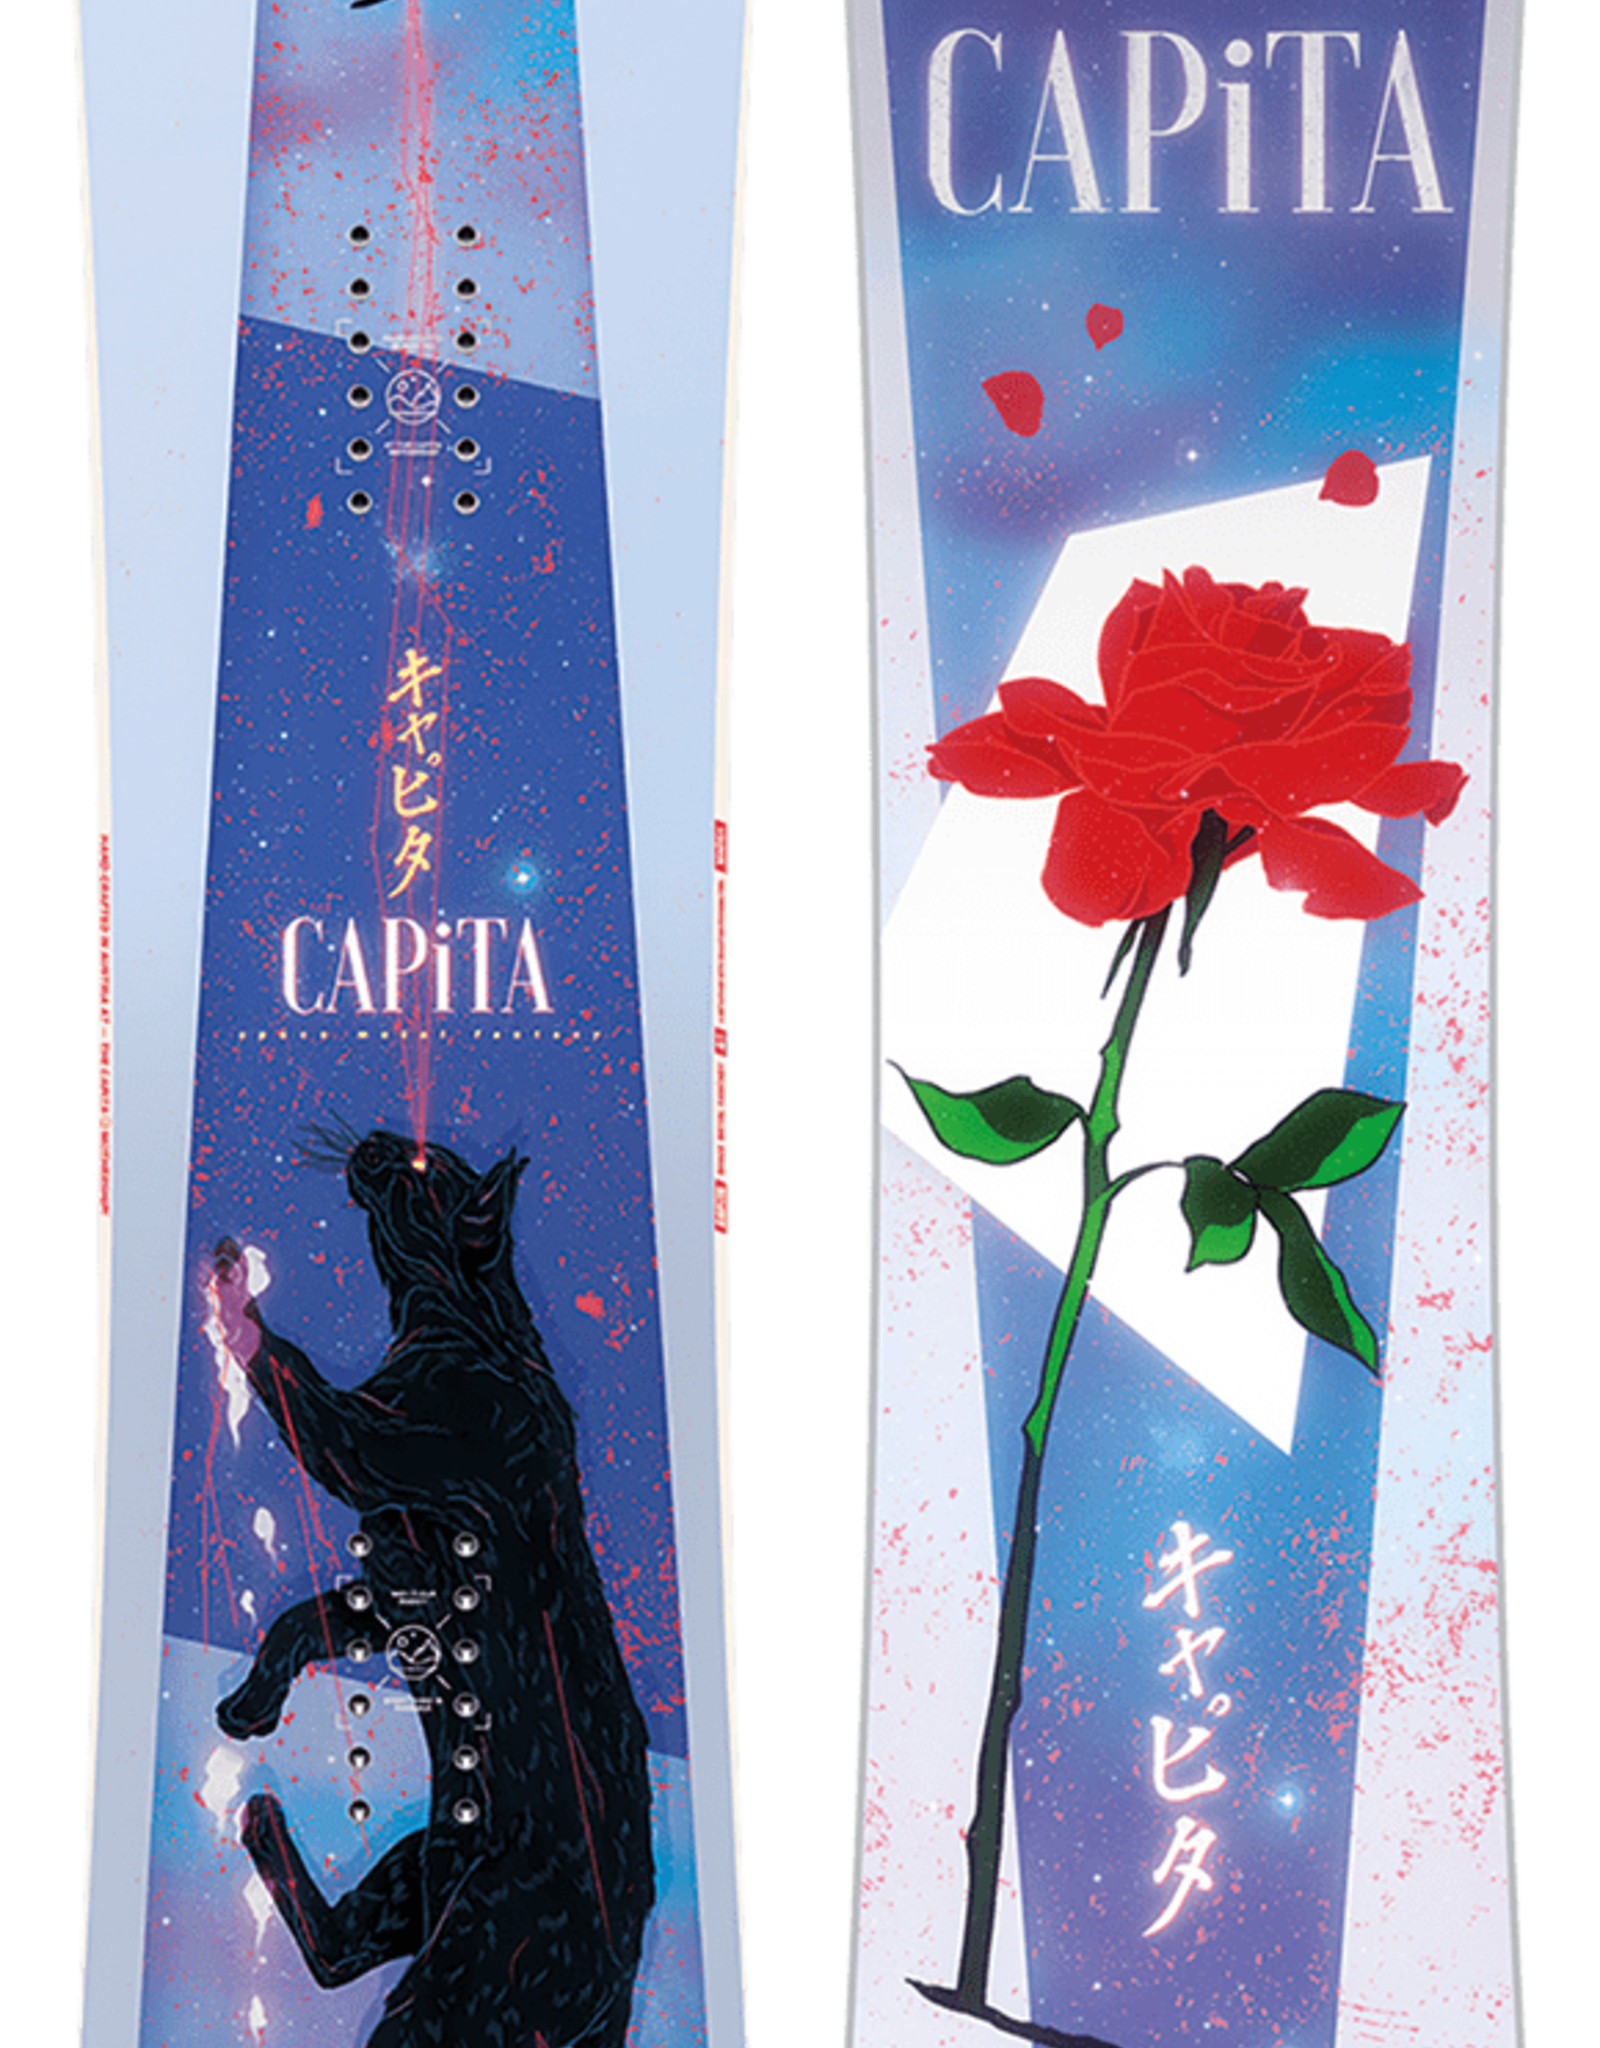 Capita - SPACE METAL FANTASY (2021) - 149cm